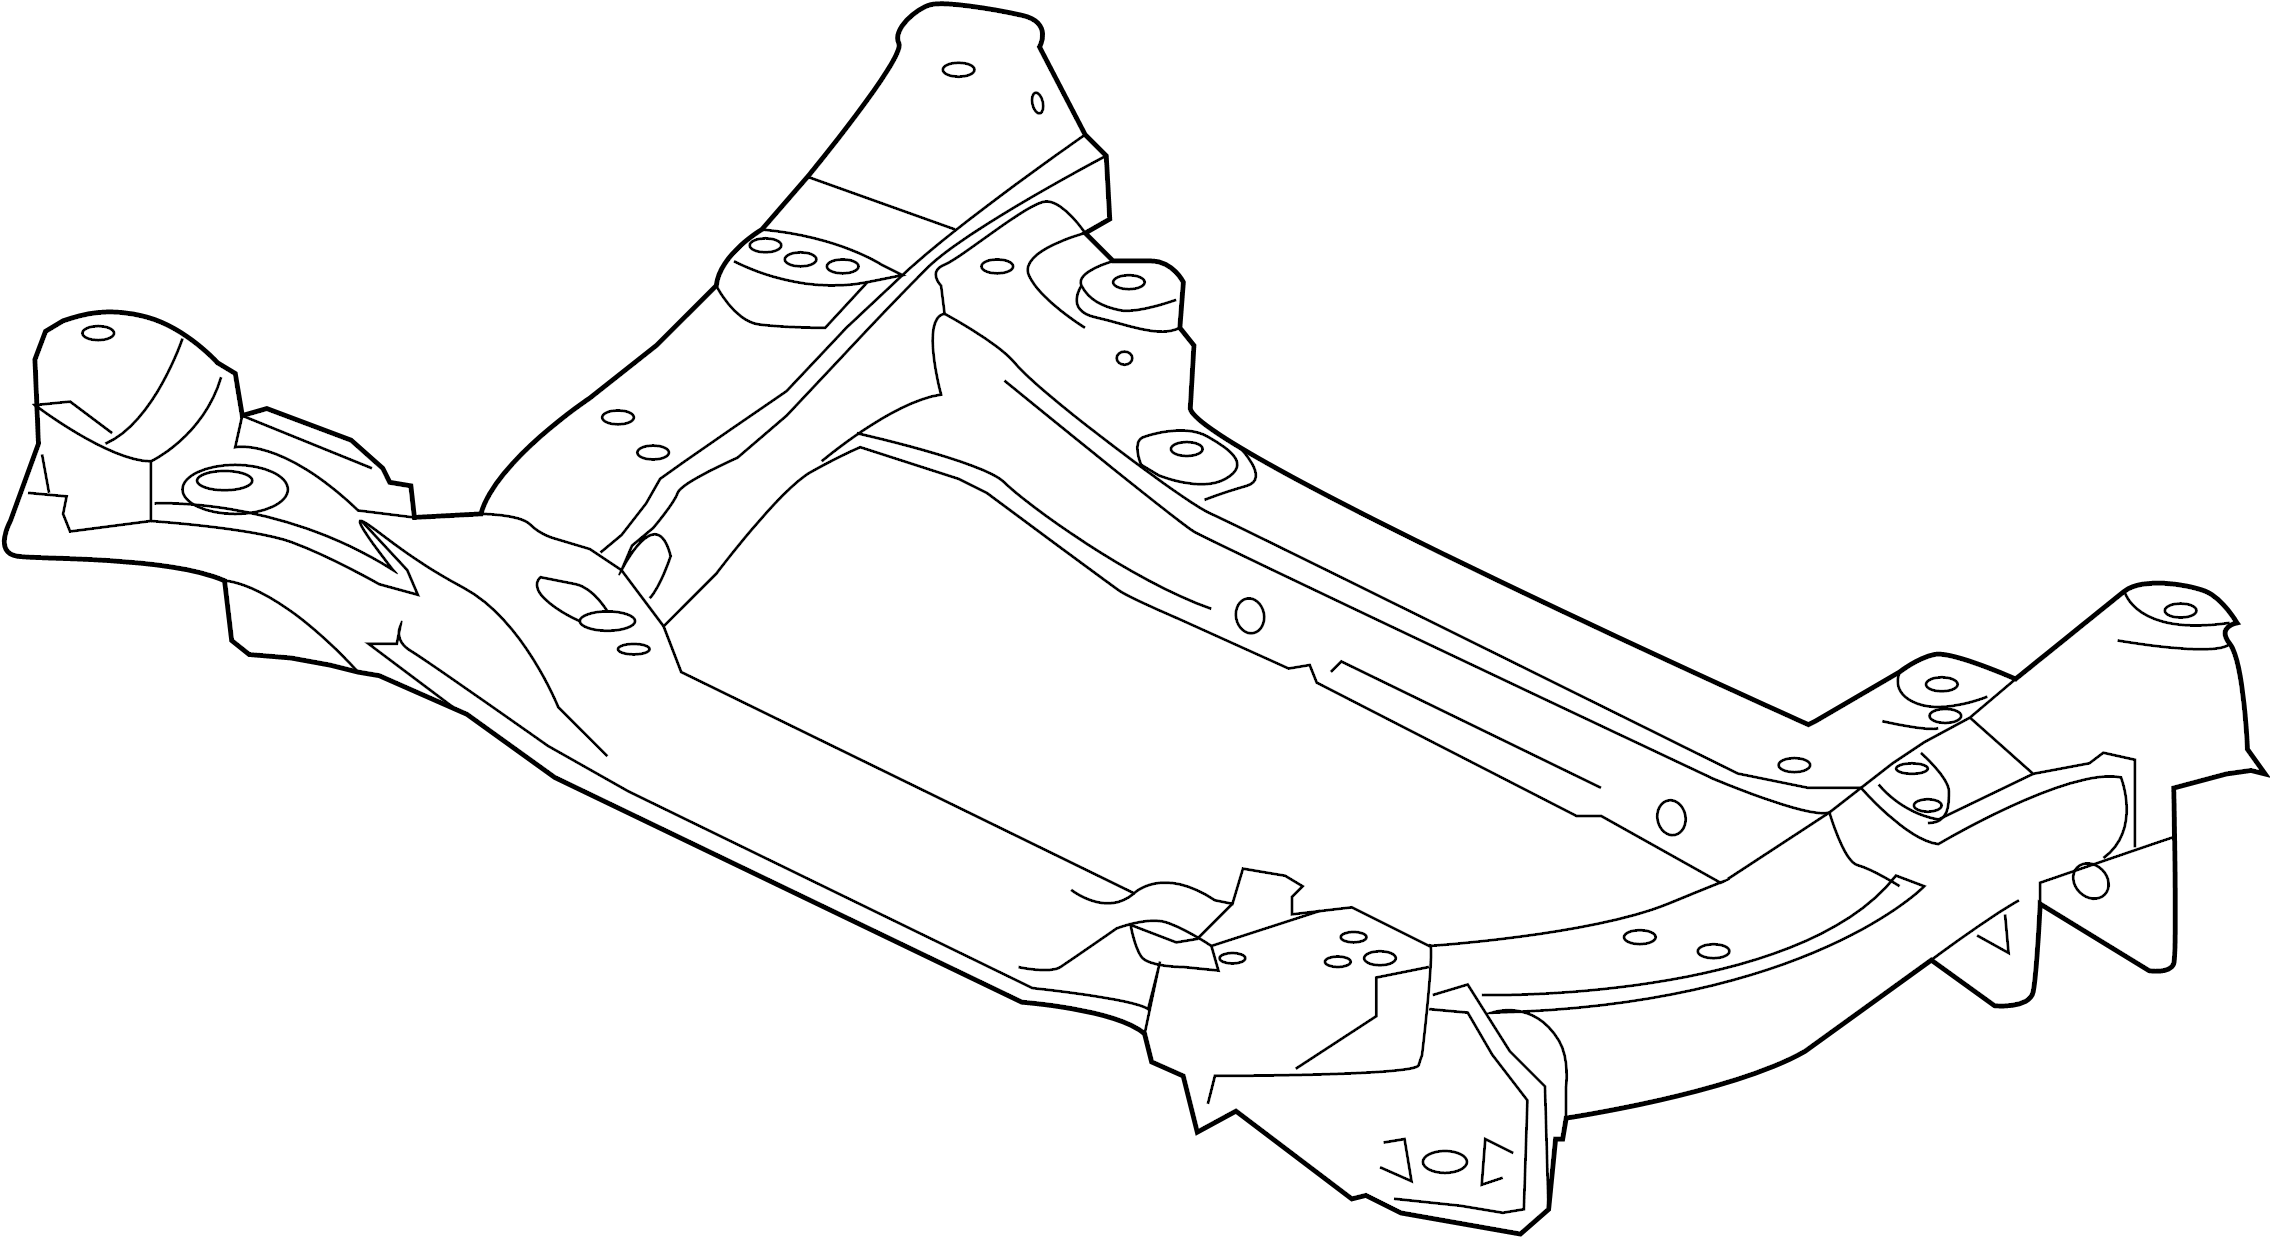 jaguar xfr crossbeam  engine cradle  w  awd  suspension